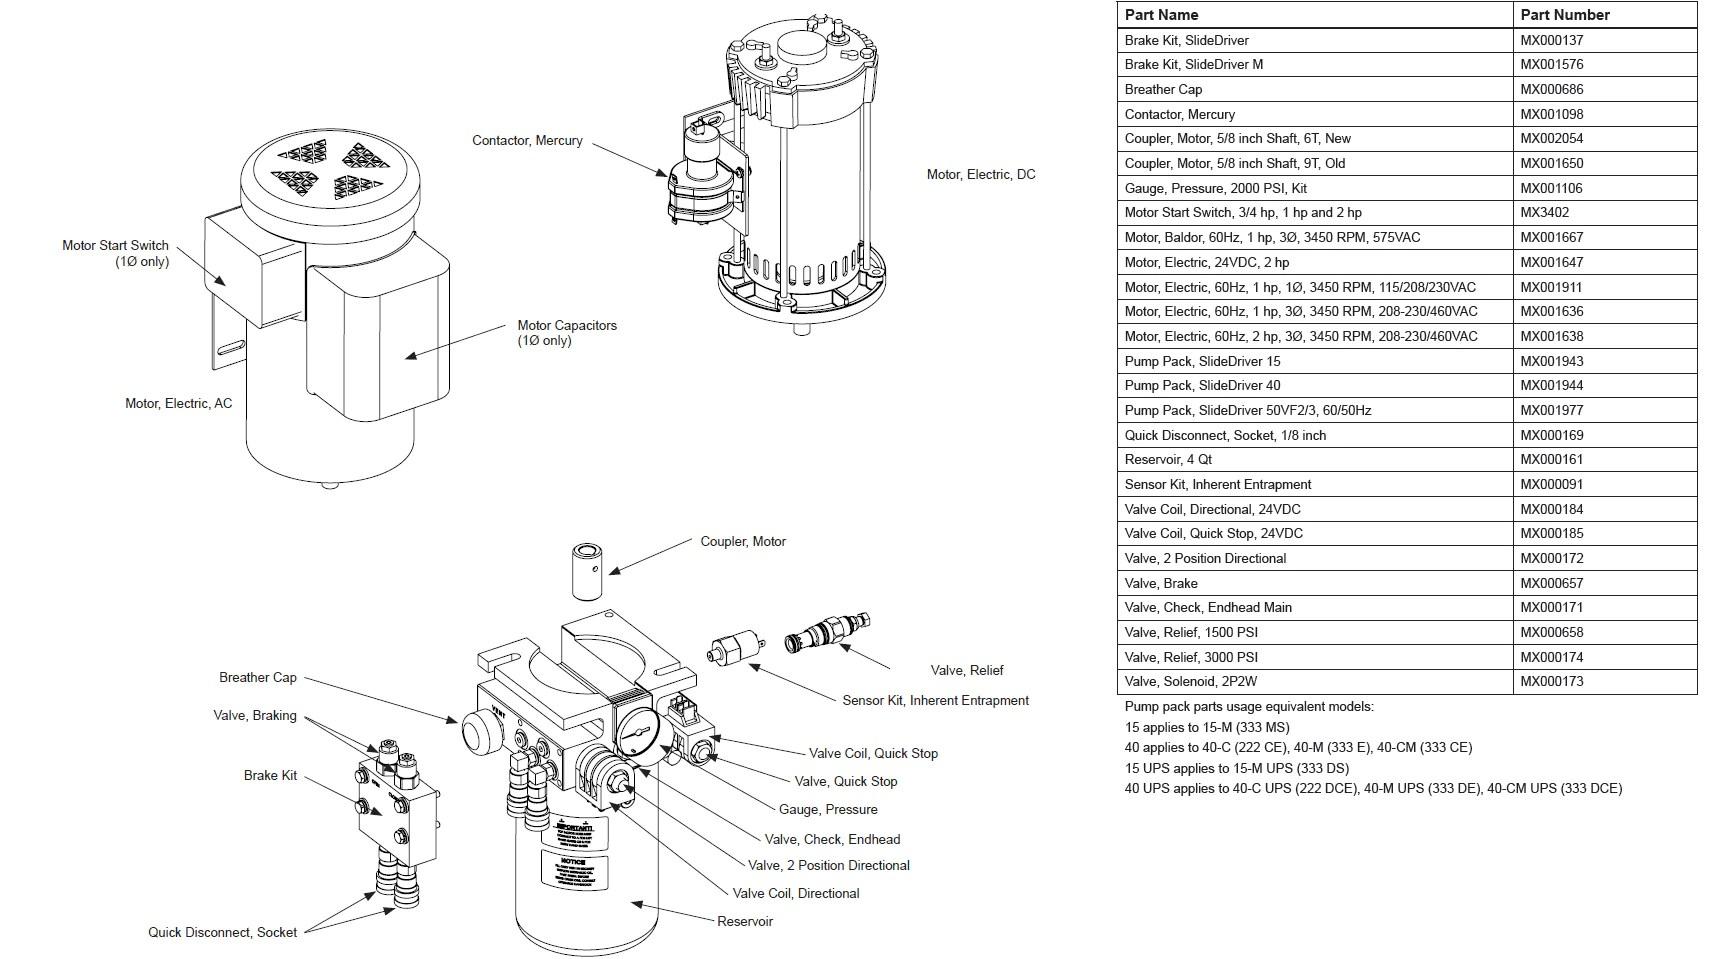 hysecurity wiring diagram